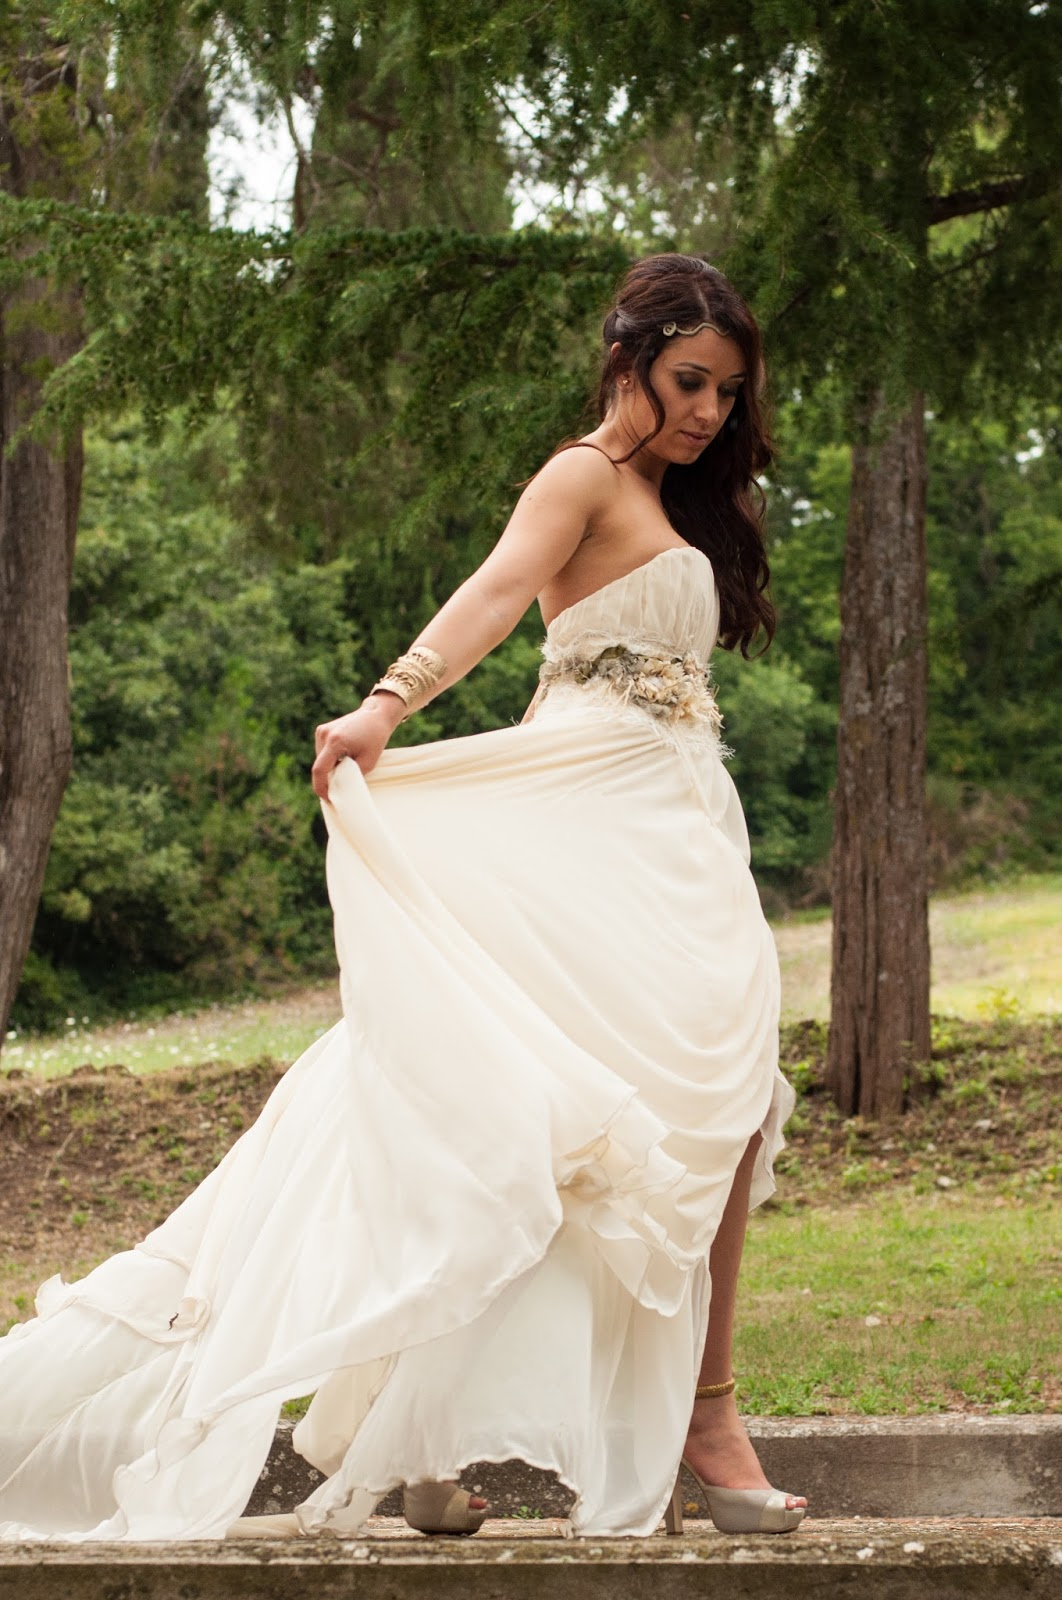 Matrimonio Bohemien Uomo : Matrimonio bohémien lovely wedding